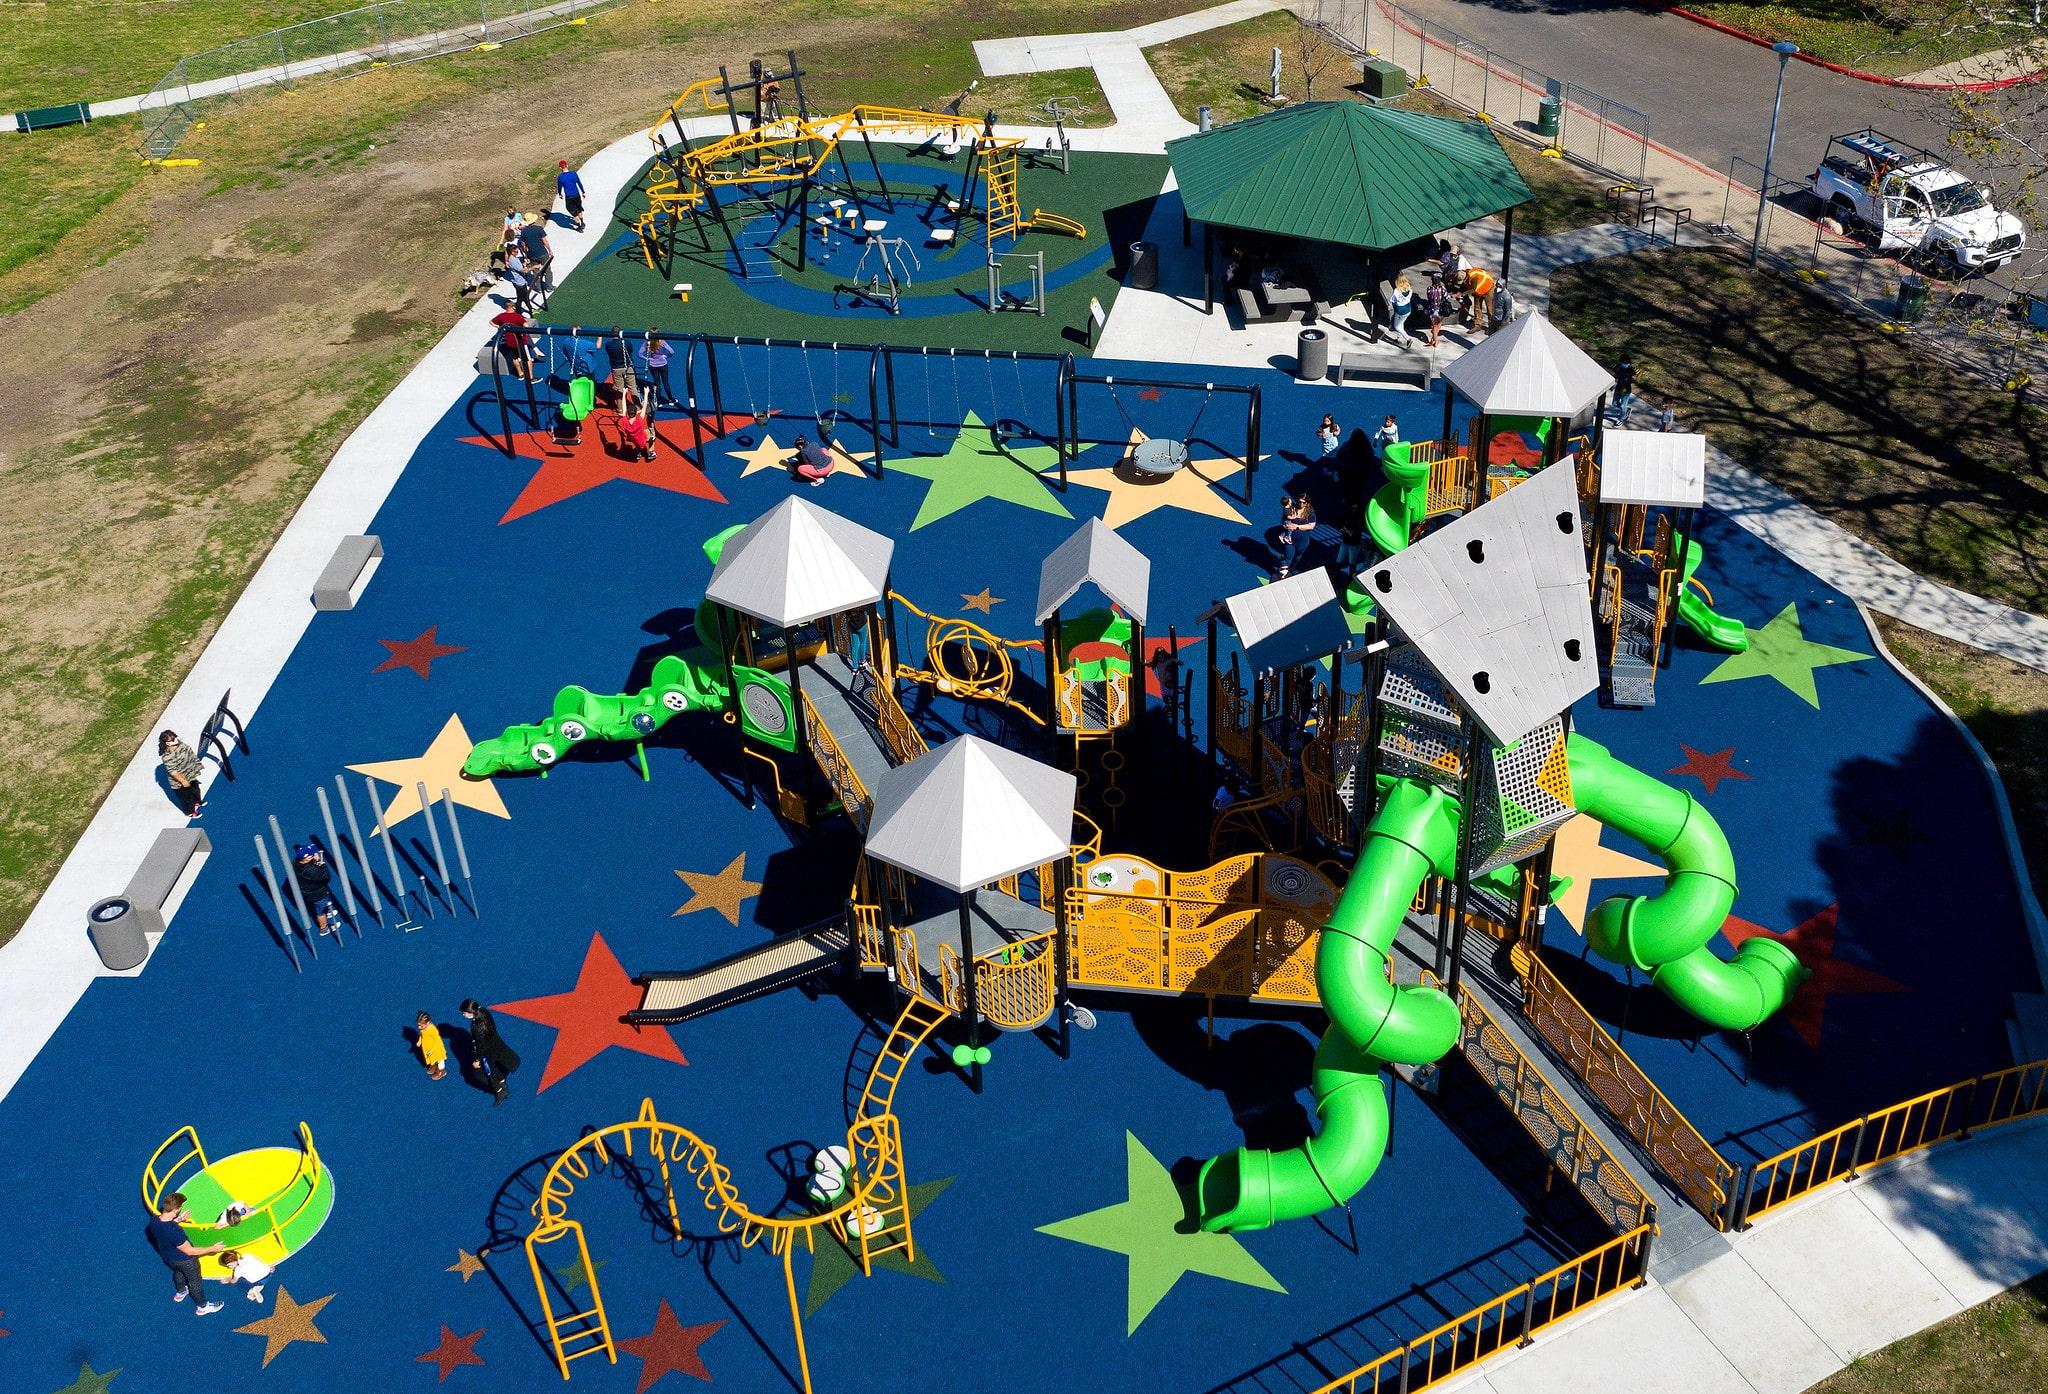 overhead view of new playground equipment setup